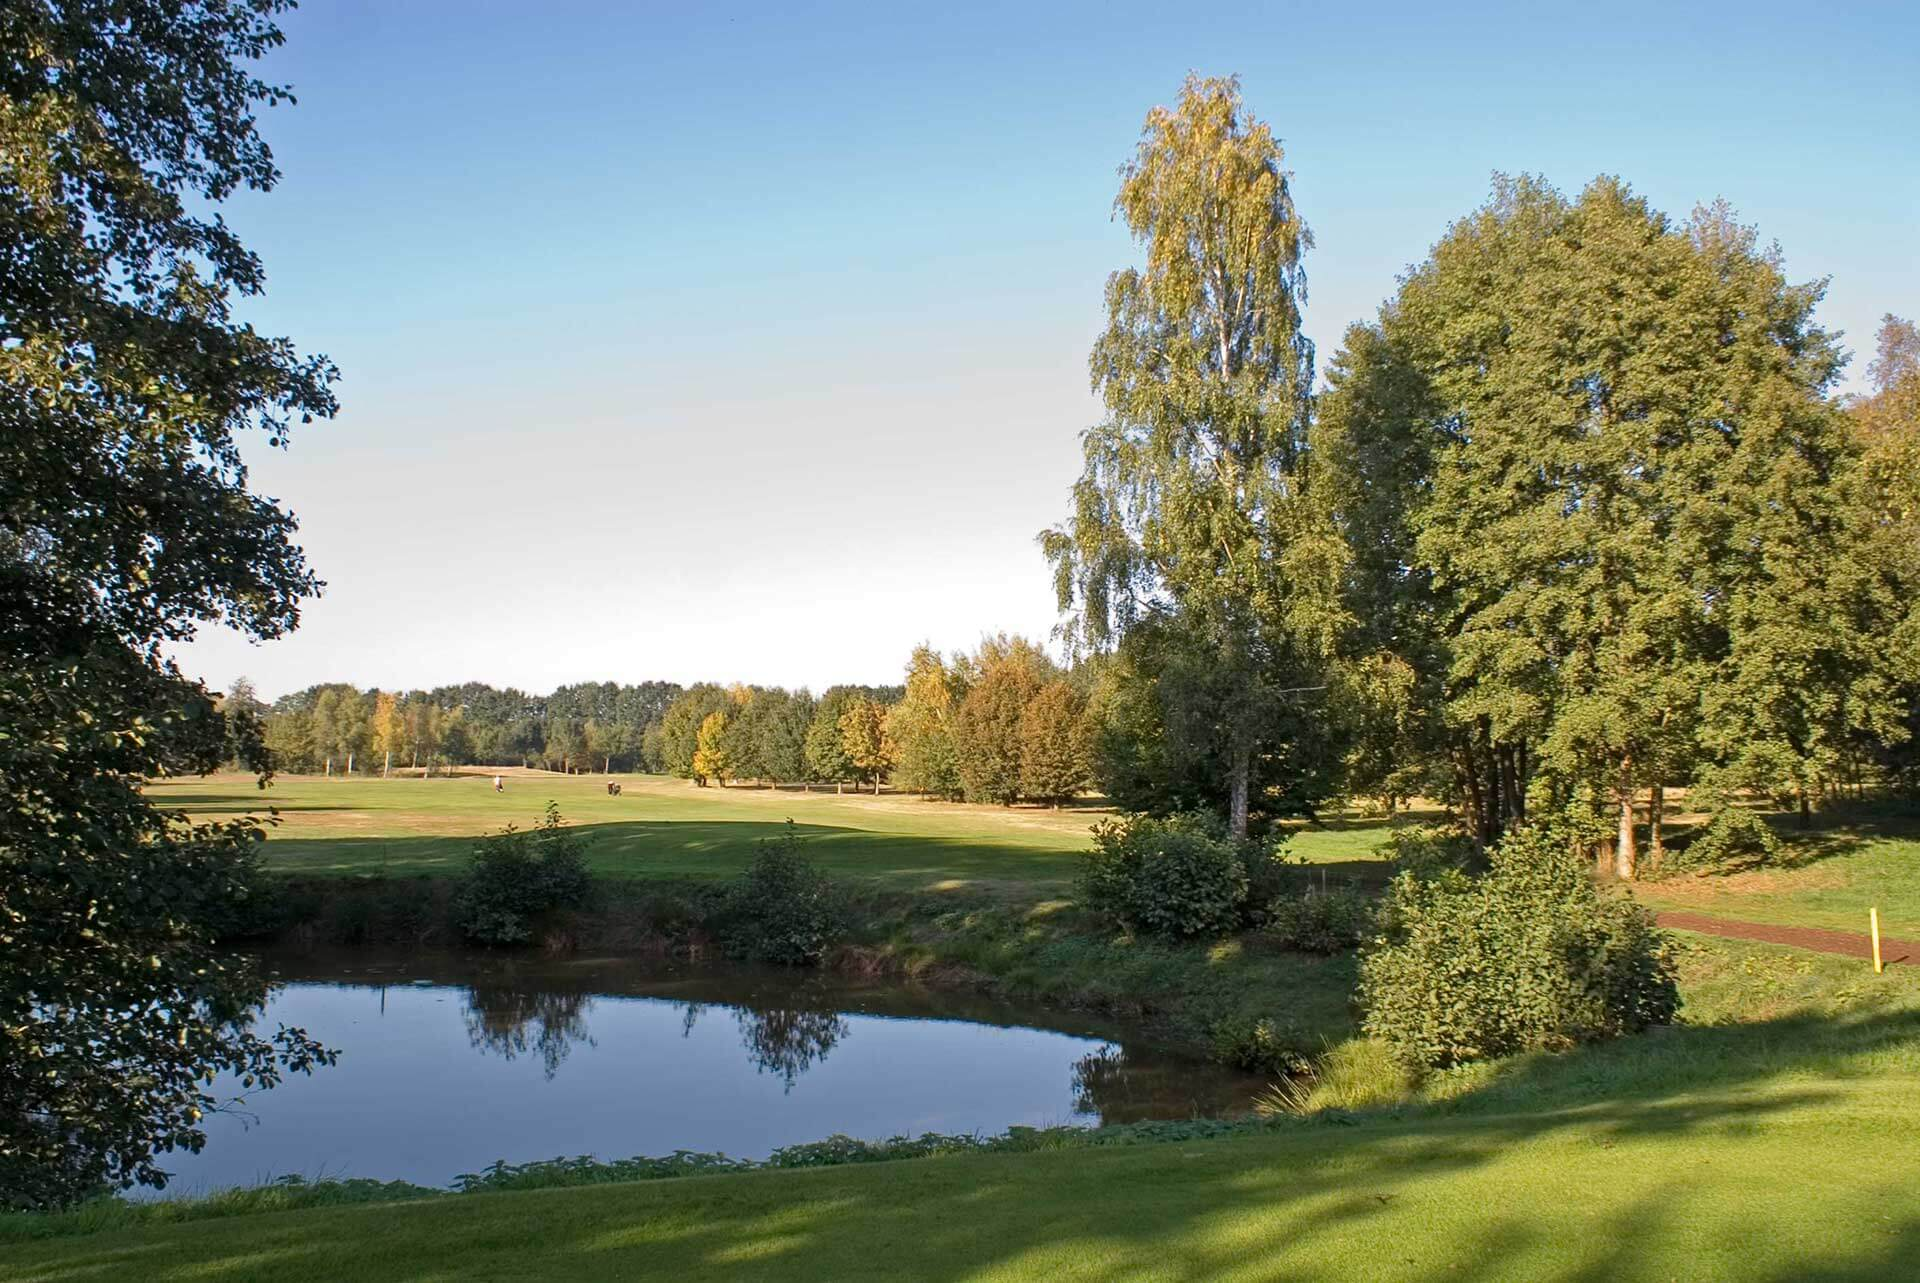 https://golfclub-peckeloh.de/wp-content/uploads/2018/02/PICT0305-2.jpg